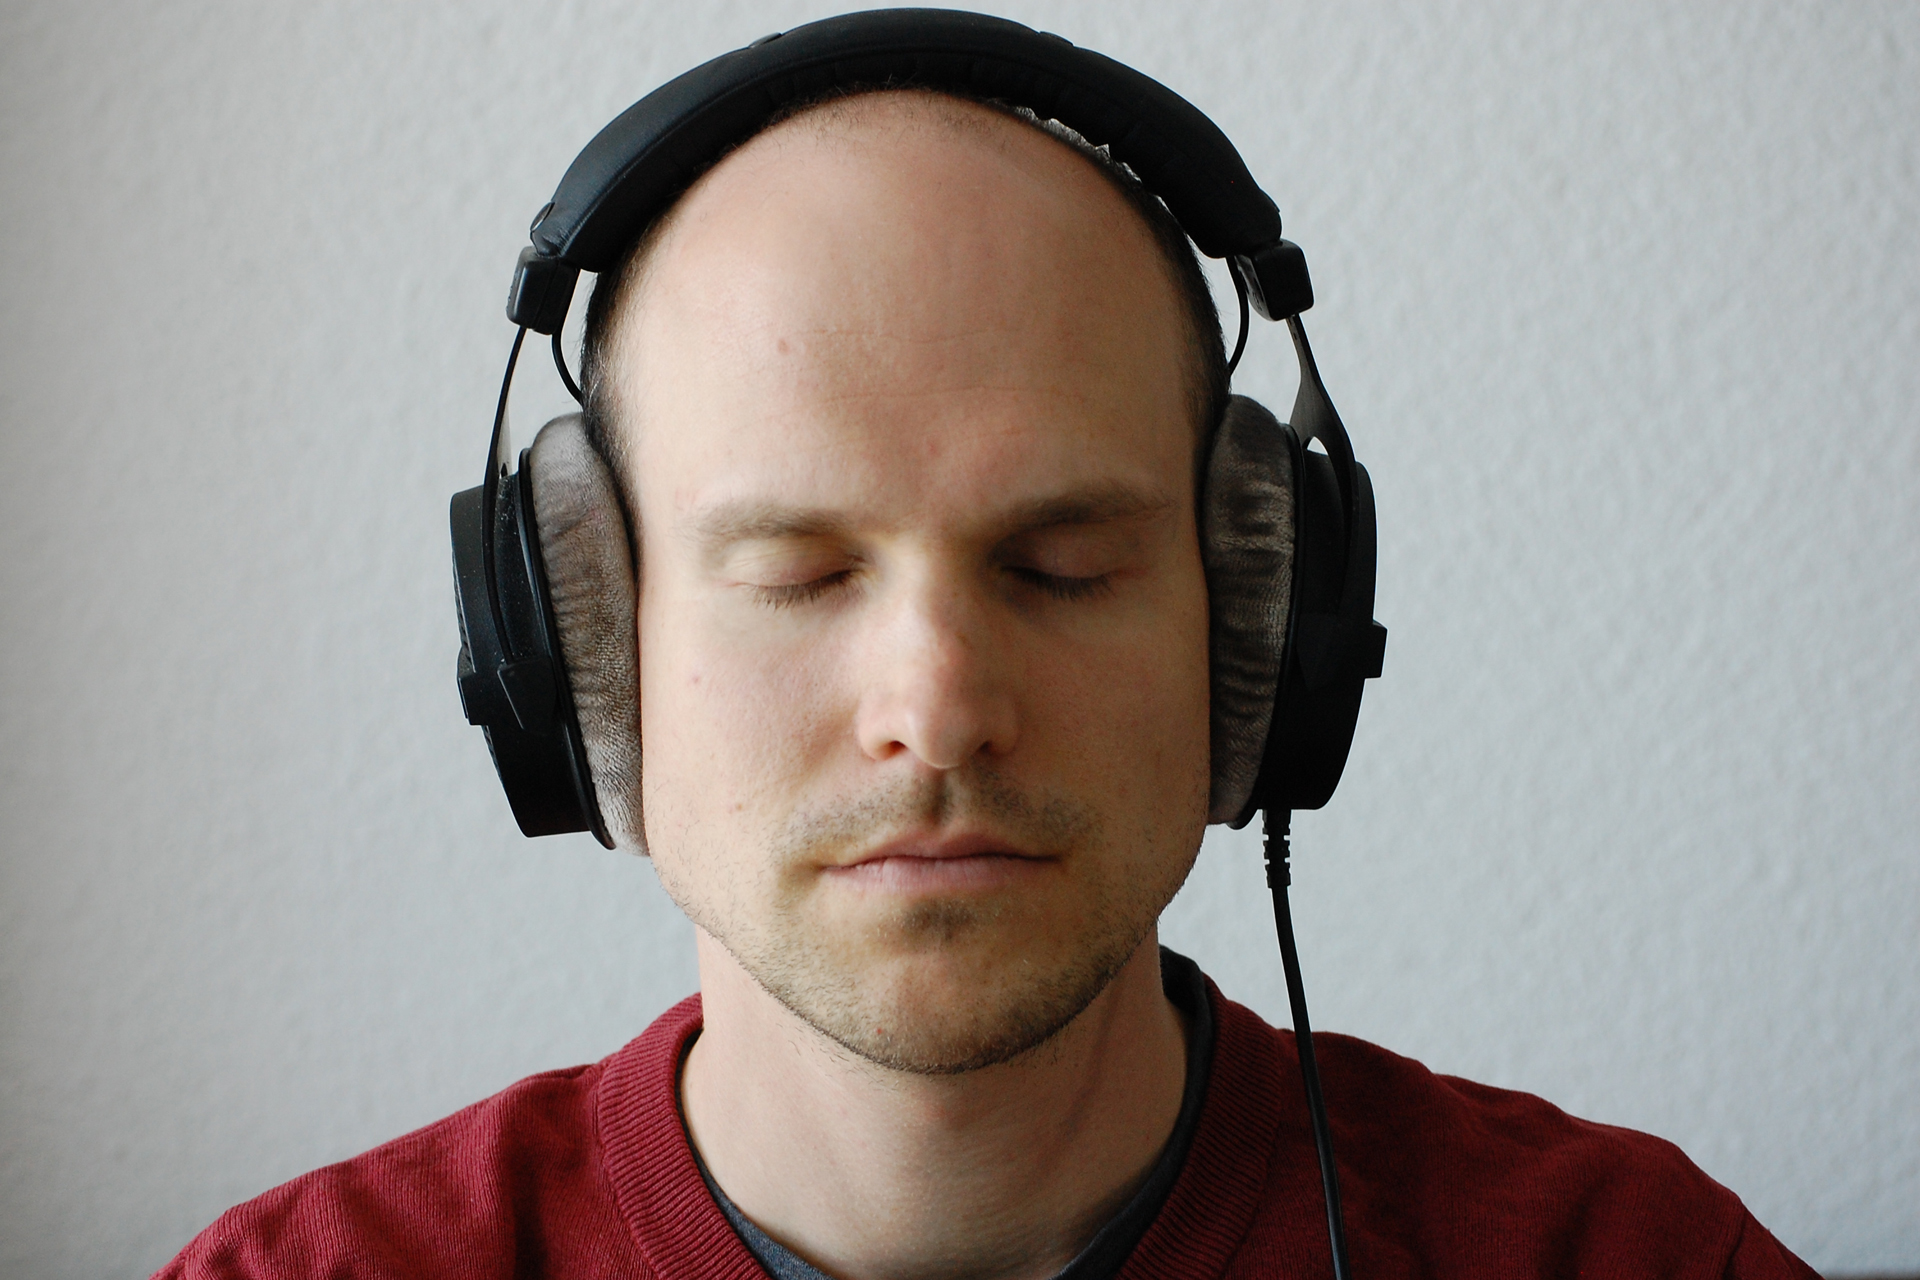 Dominik mit Kopfhörern